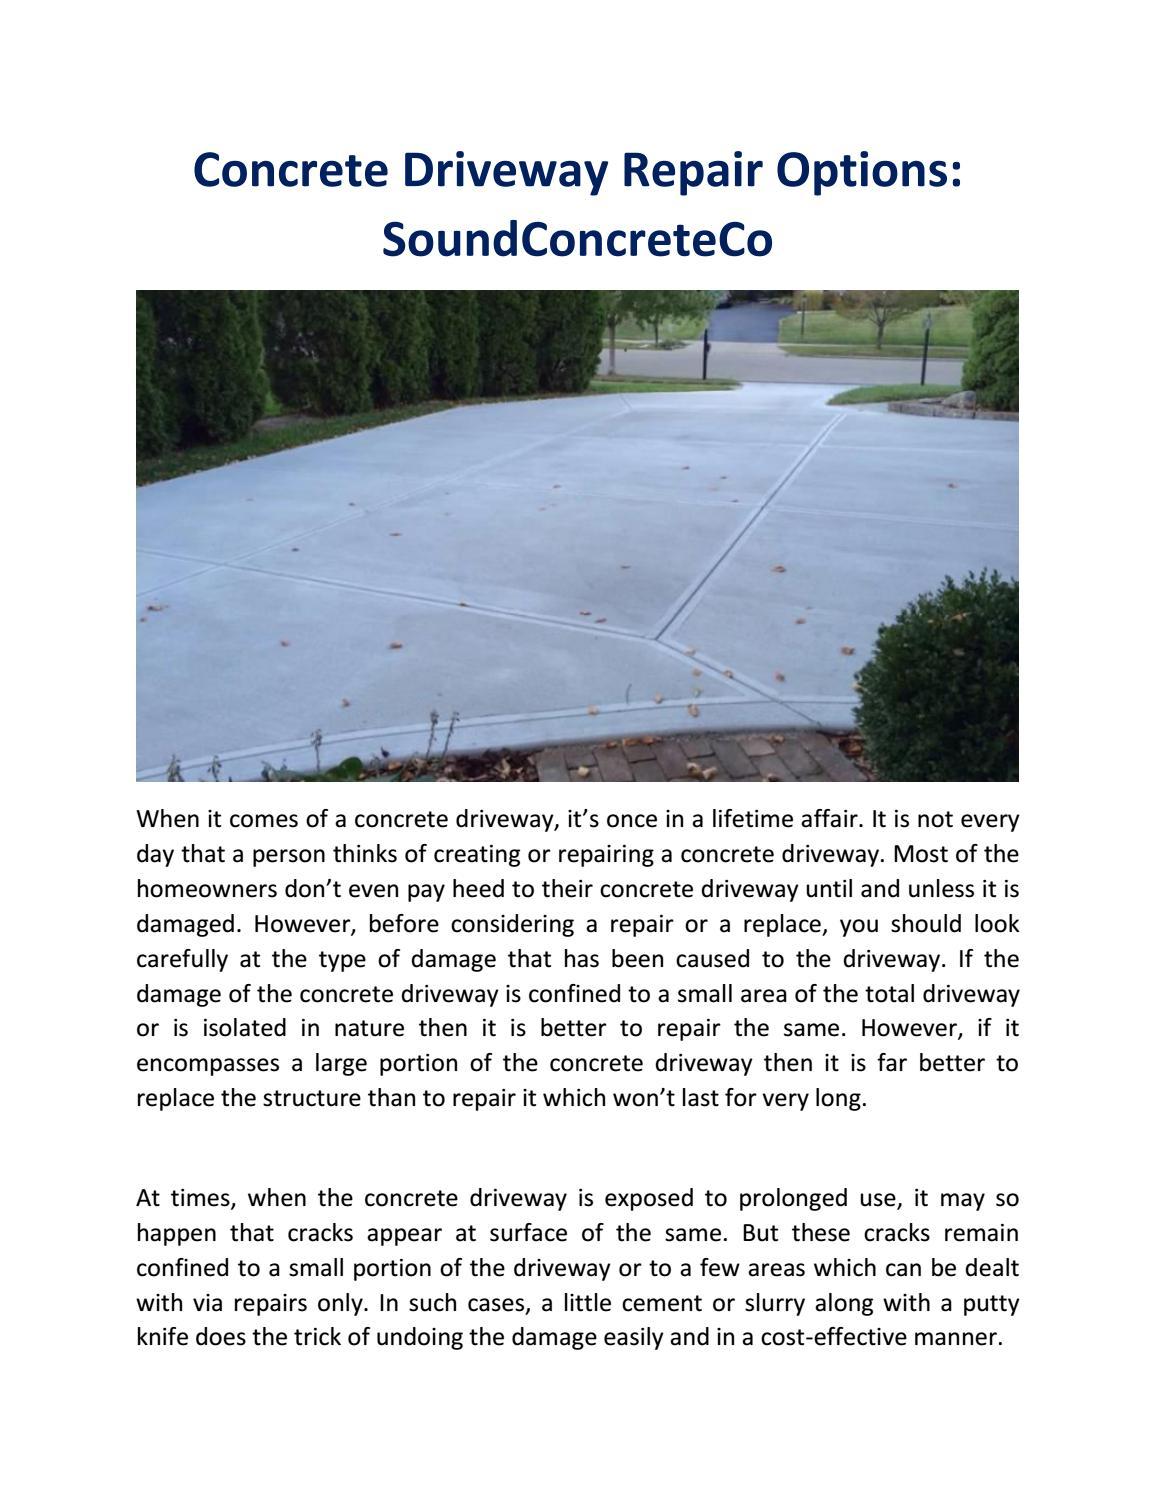 Concrete Driveway Repair Options Soundconcreteco By Soundconcreteco Issuu